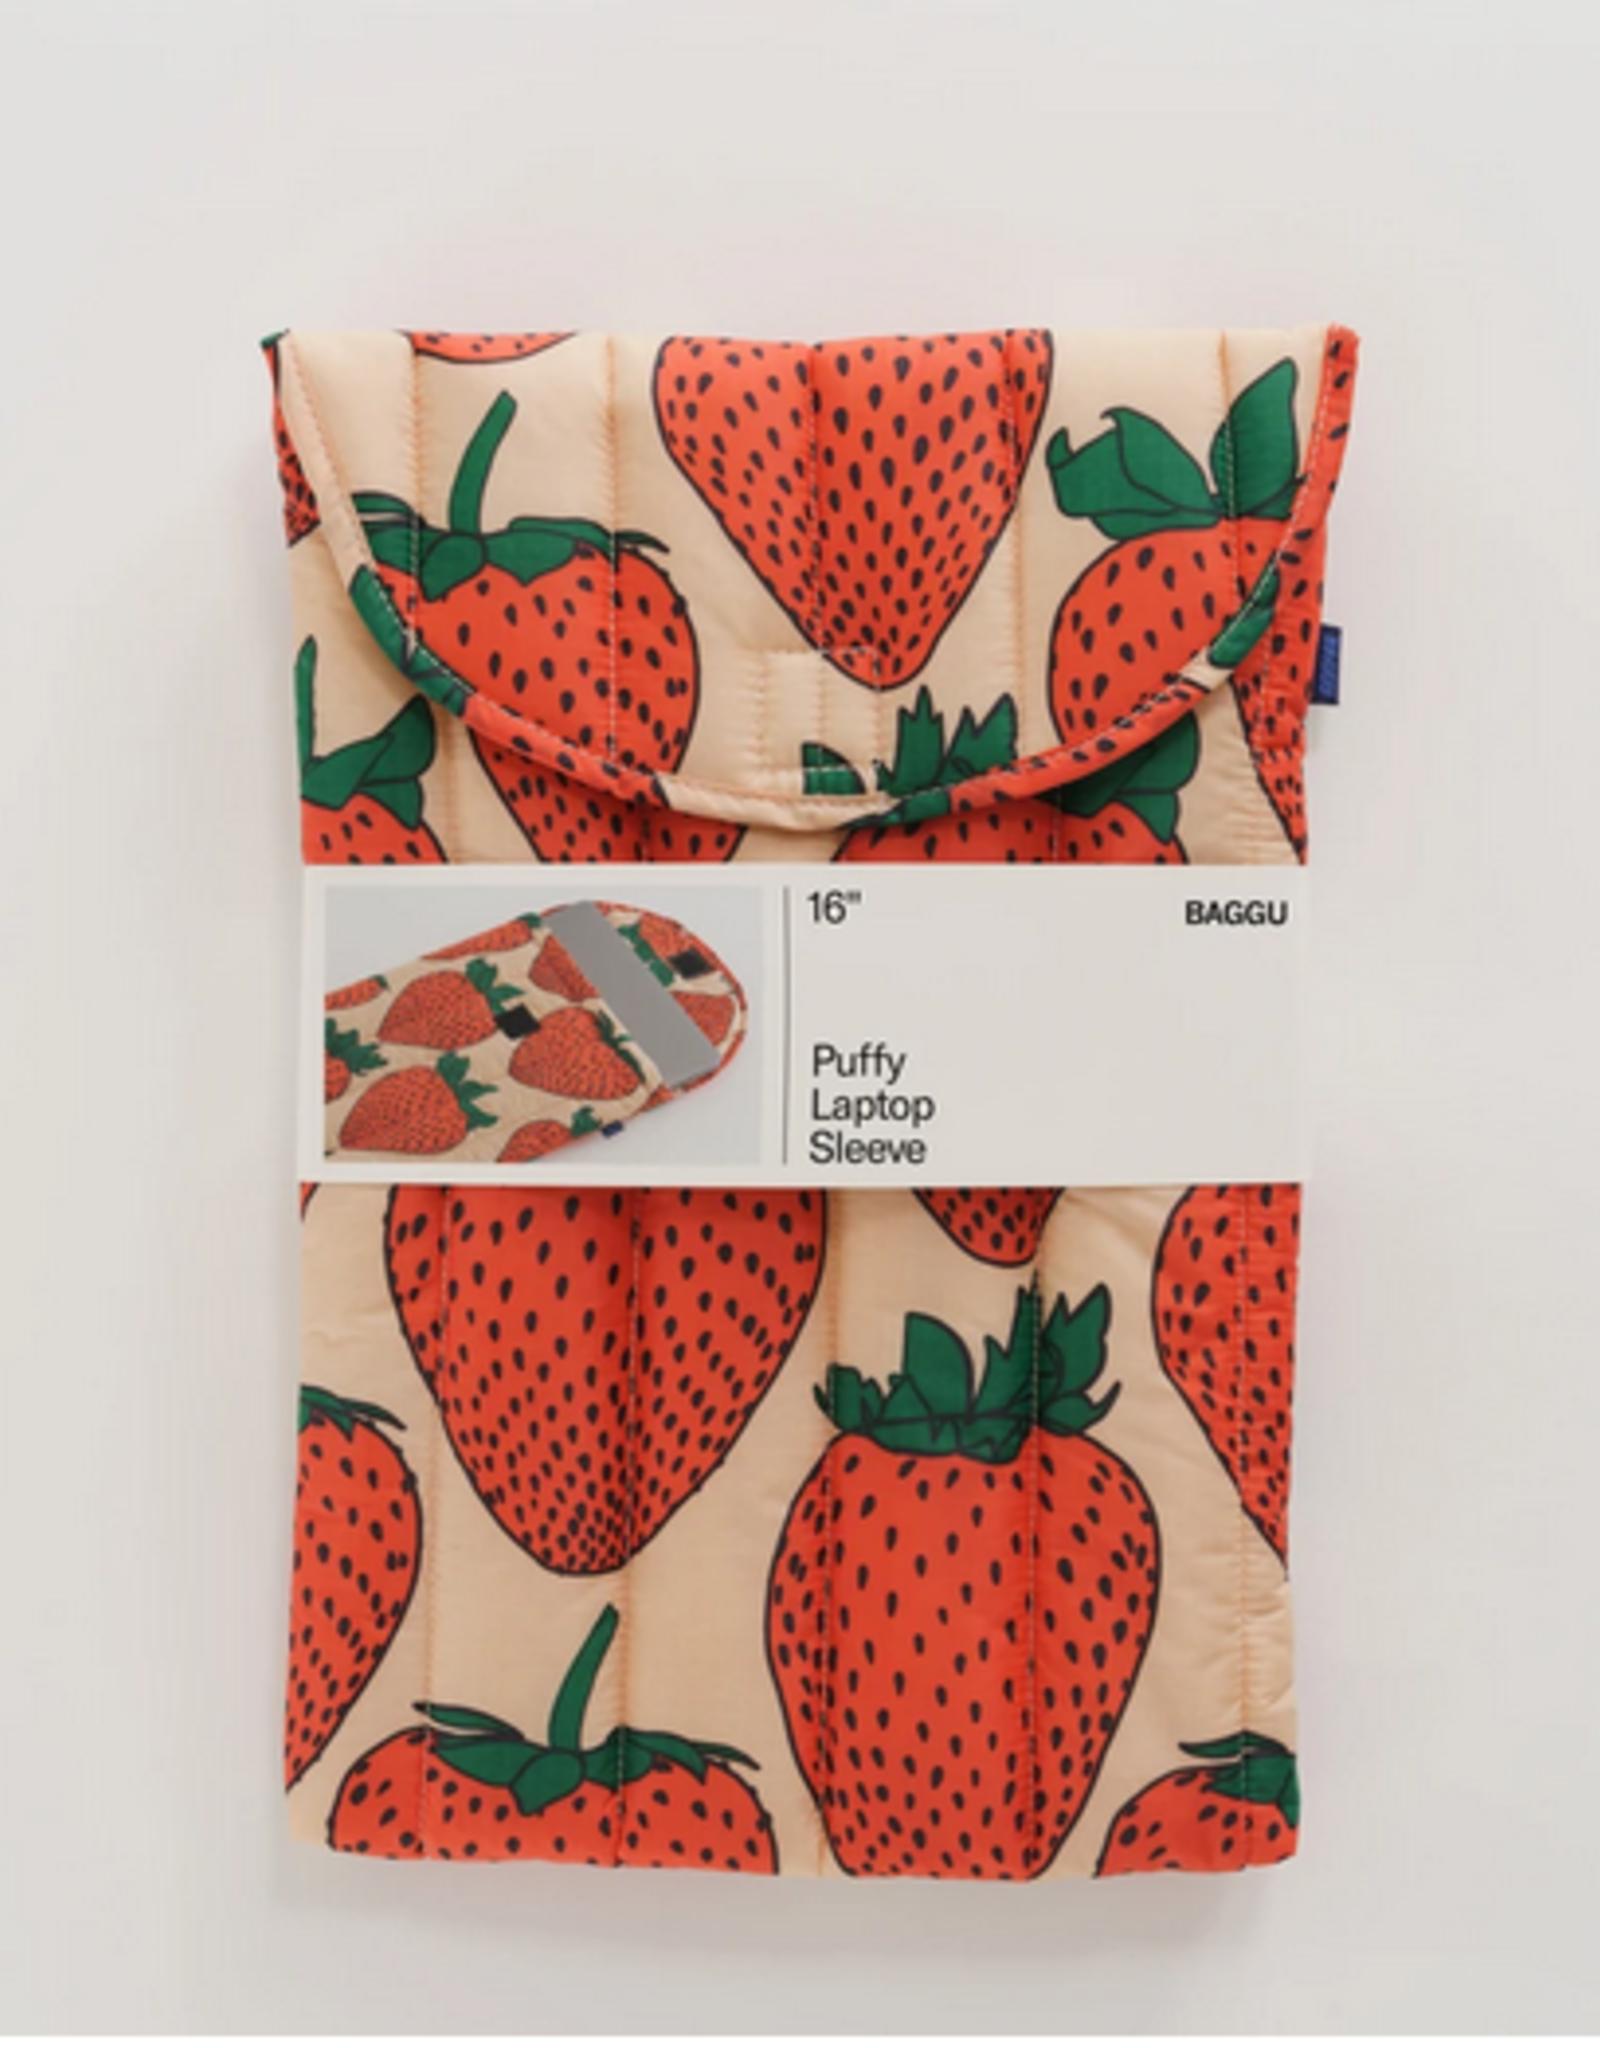 Baggu Puffy laptop sleeve strawberry 16 inch